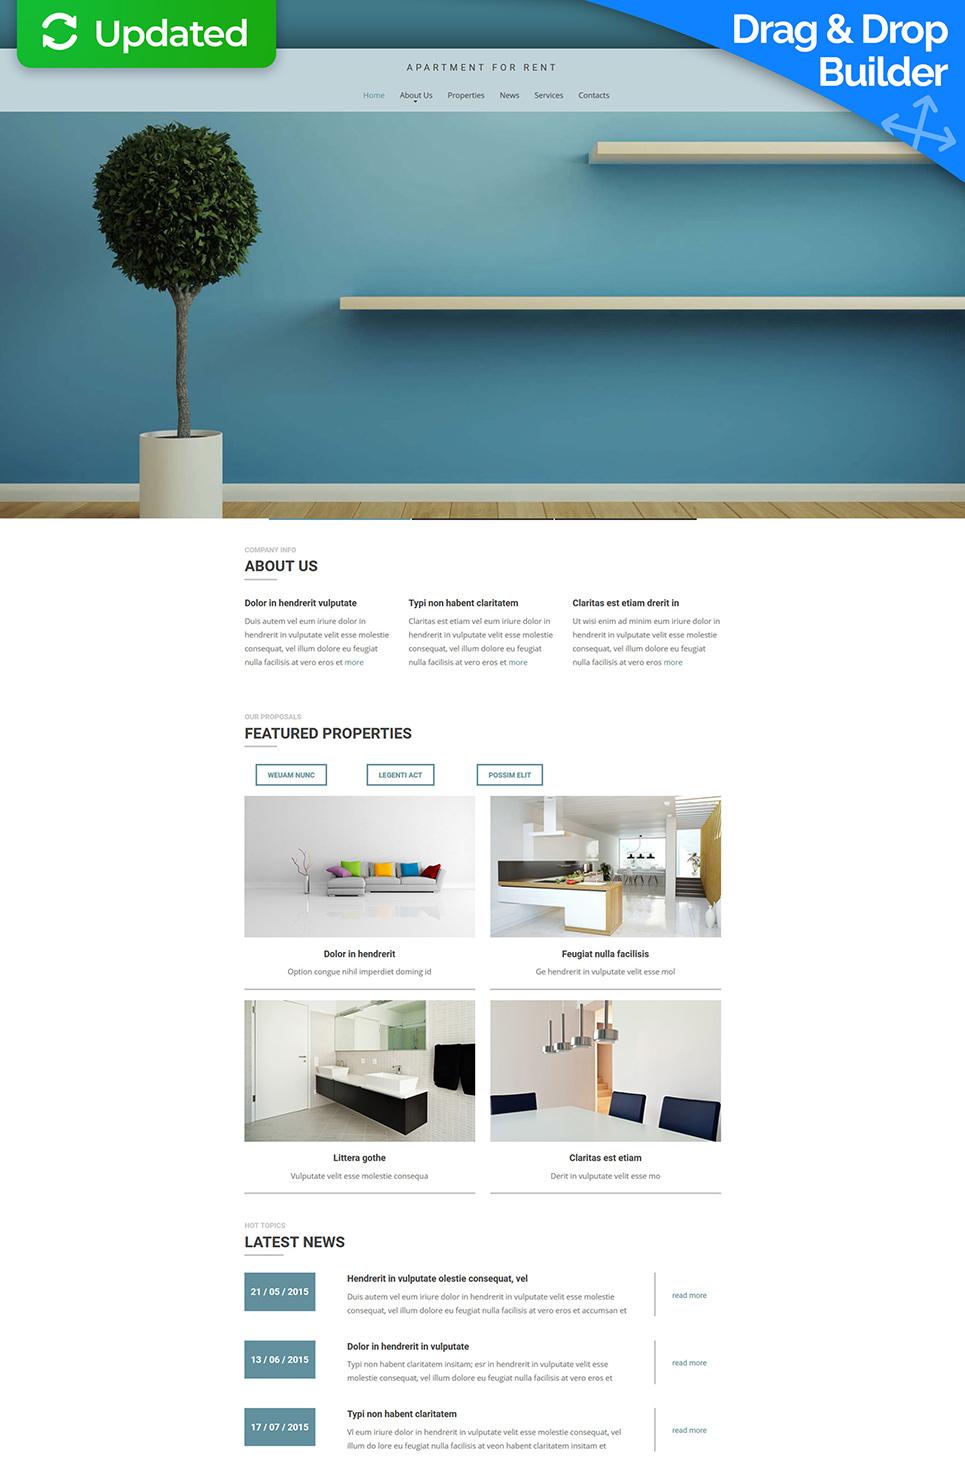 Шаблон для сайта агентства по аренде квартир - image